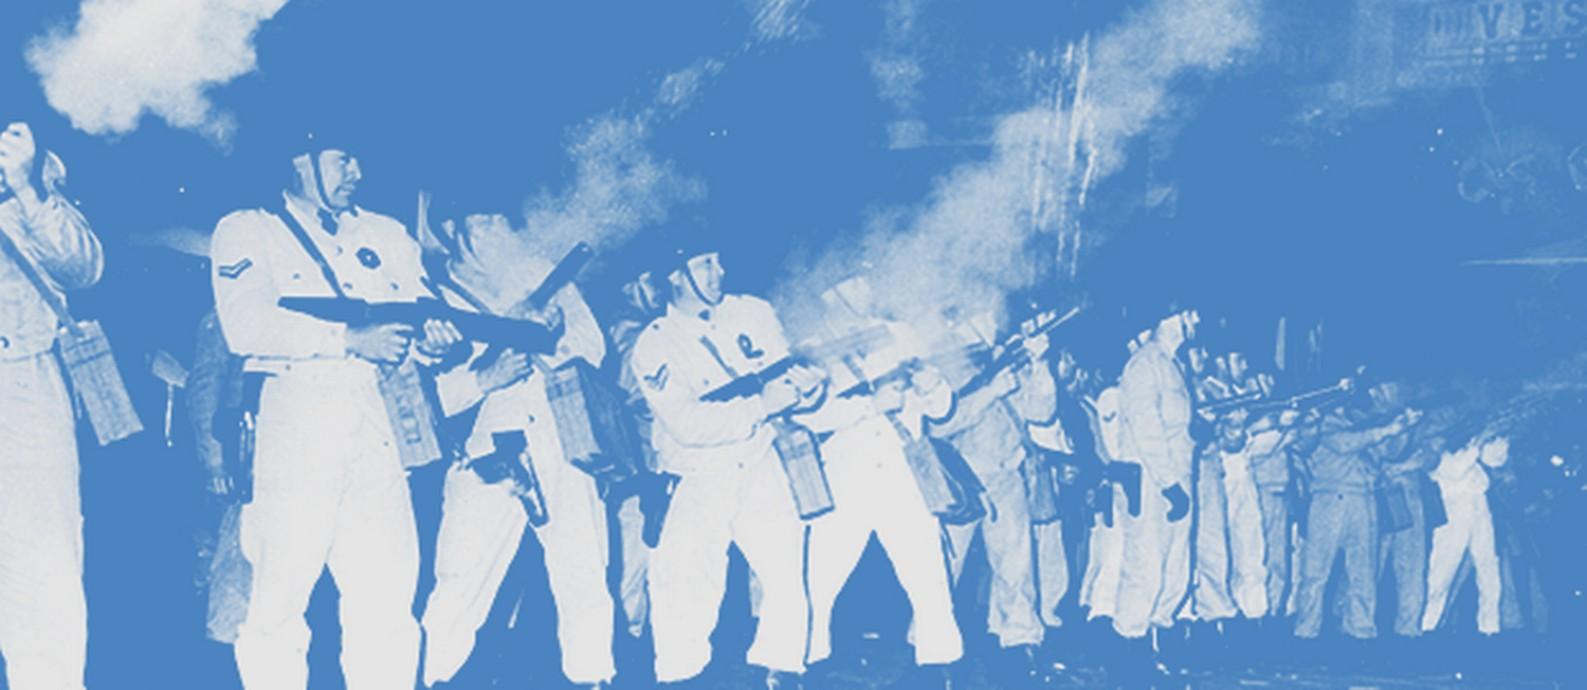 Polícia argentina atira bombas de gás lacrimogêneo em manifestantes peronistas Foto: Keystone / Getty